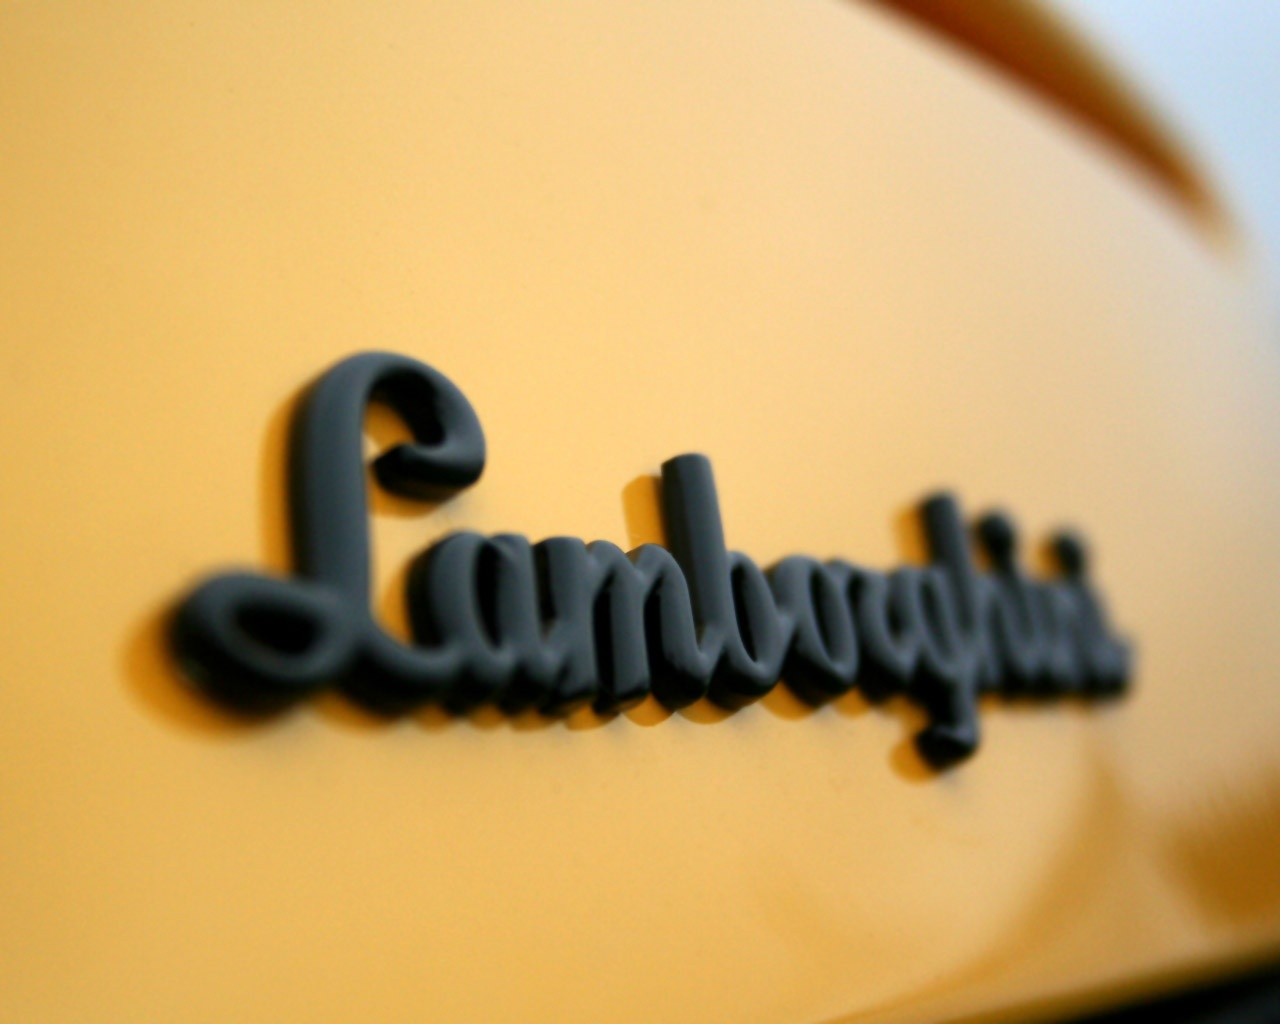 Black Font Logo Lamborghini Car Photo Picture HD Wallpaper Free